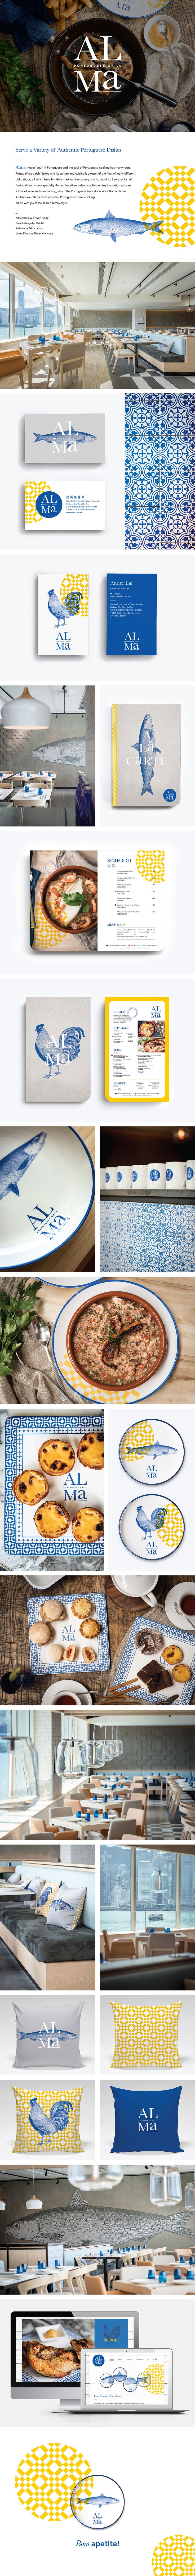 Alma Portugese Grill - Restaurant Branding